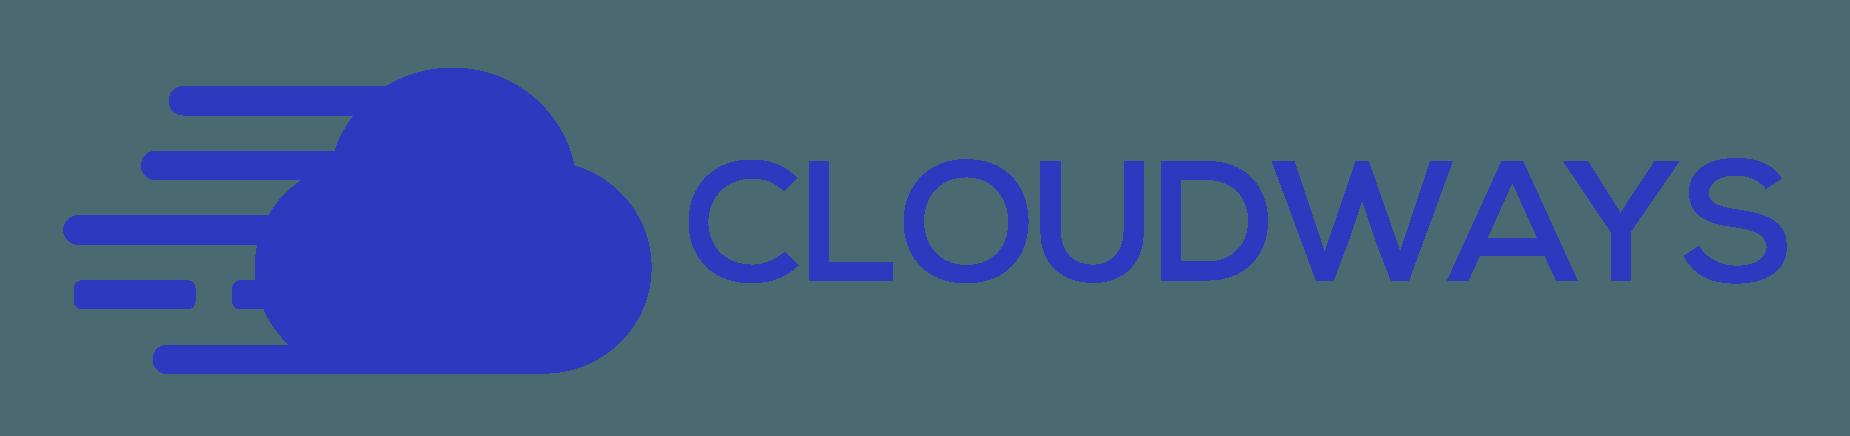 Cupones Web Hosting - cloudways logo 2